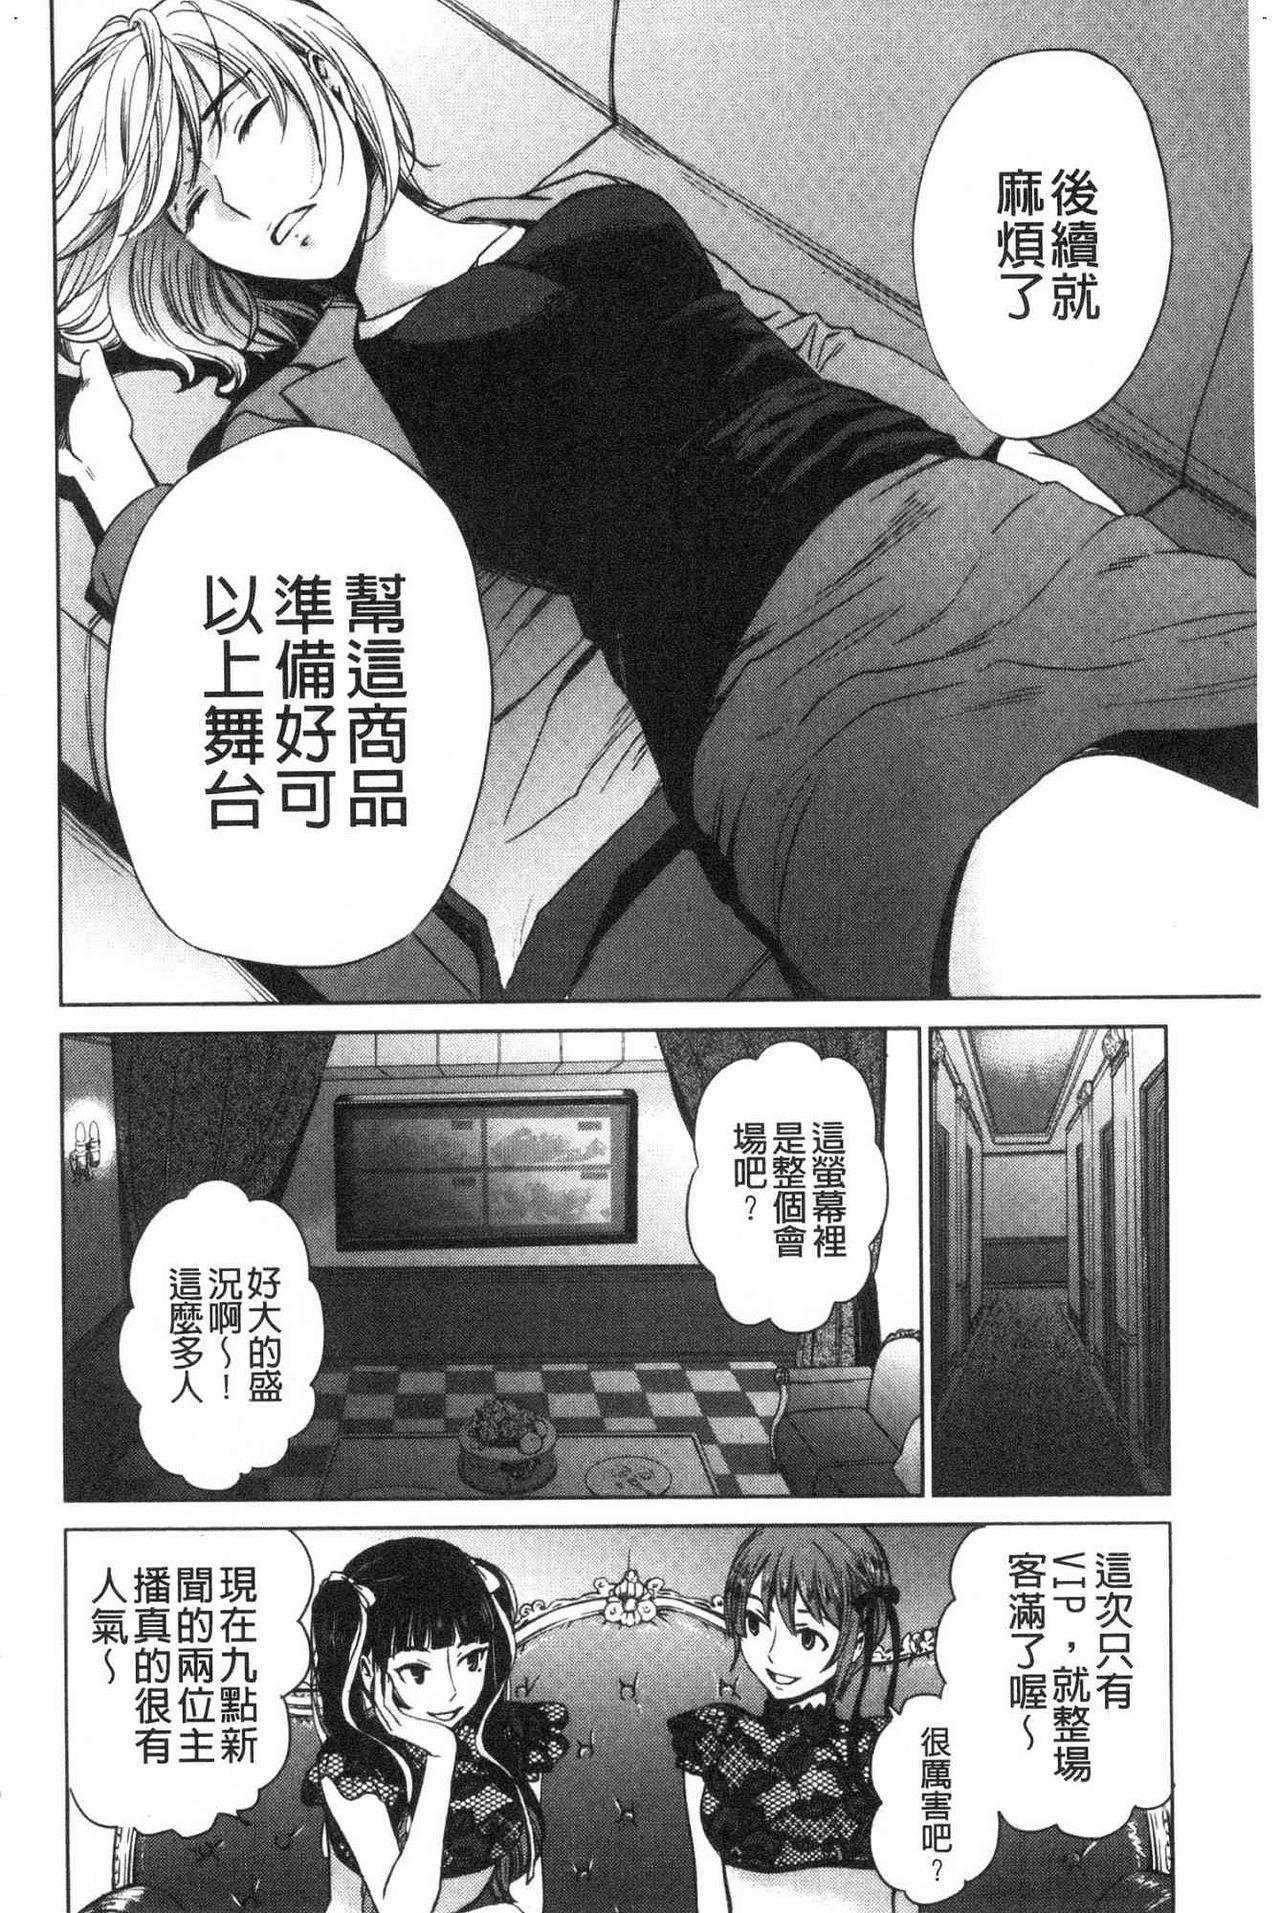 [Gotoh Akira]  21-ji no Onna ~Camera no Mae no Mesuinu~ 2 | 21時之女 ~鏡頭前的牝犬~ 2 [Chinese] 165